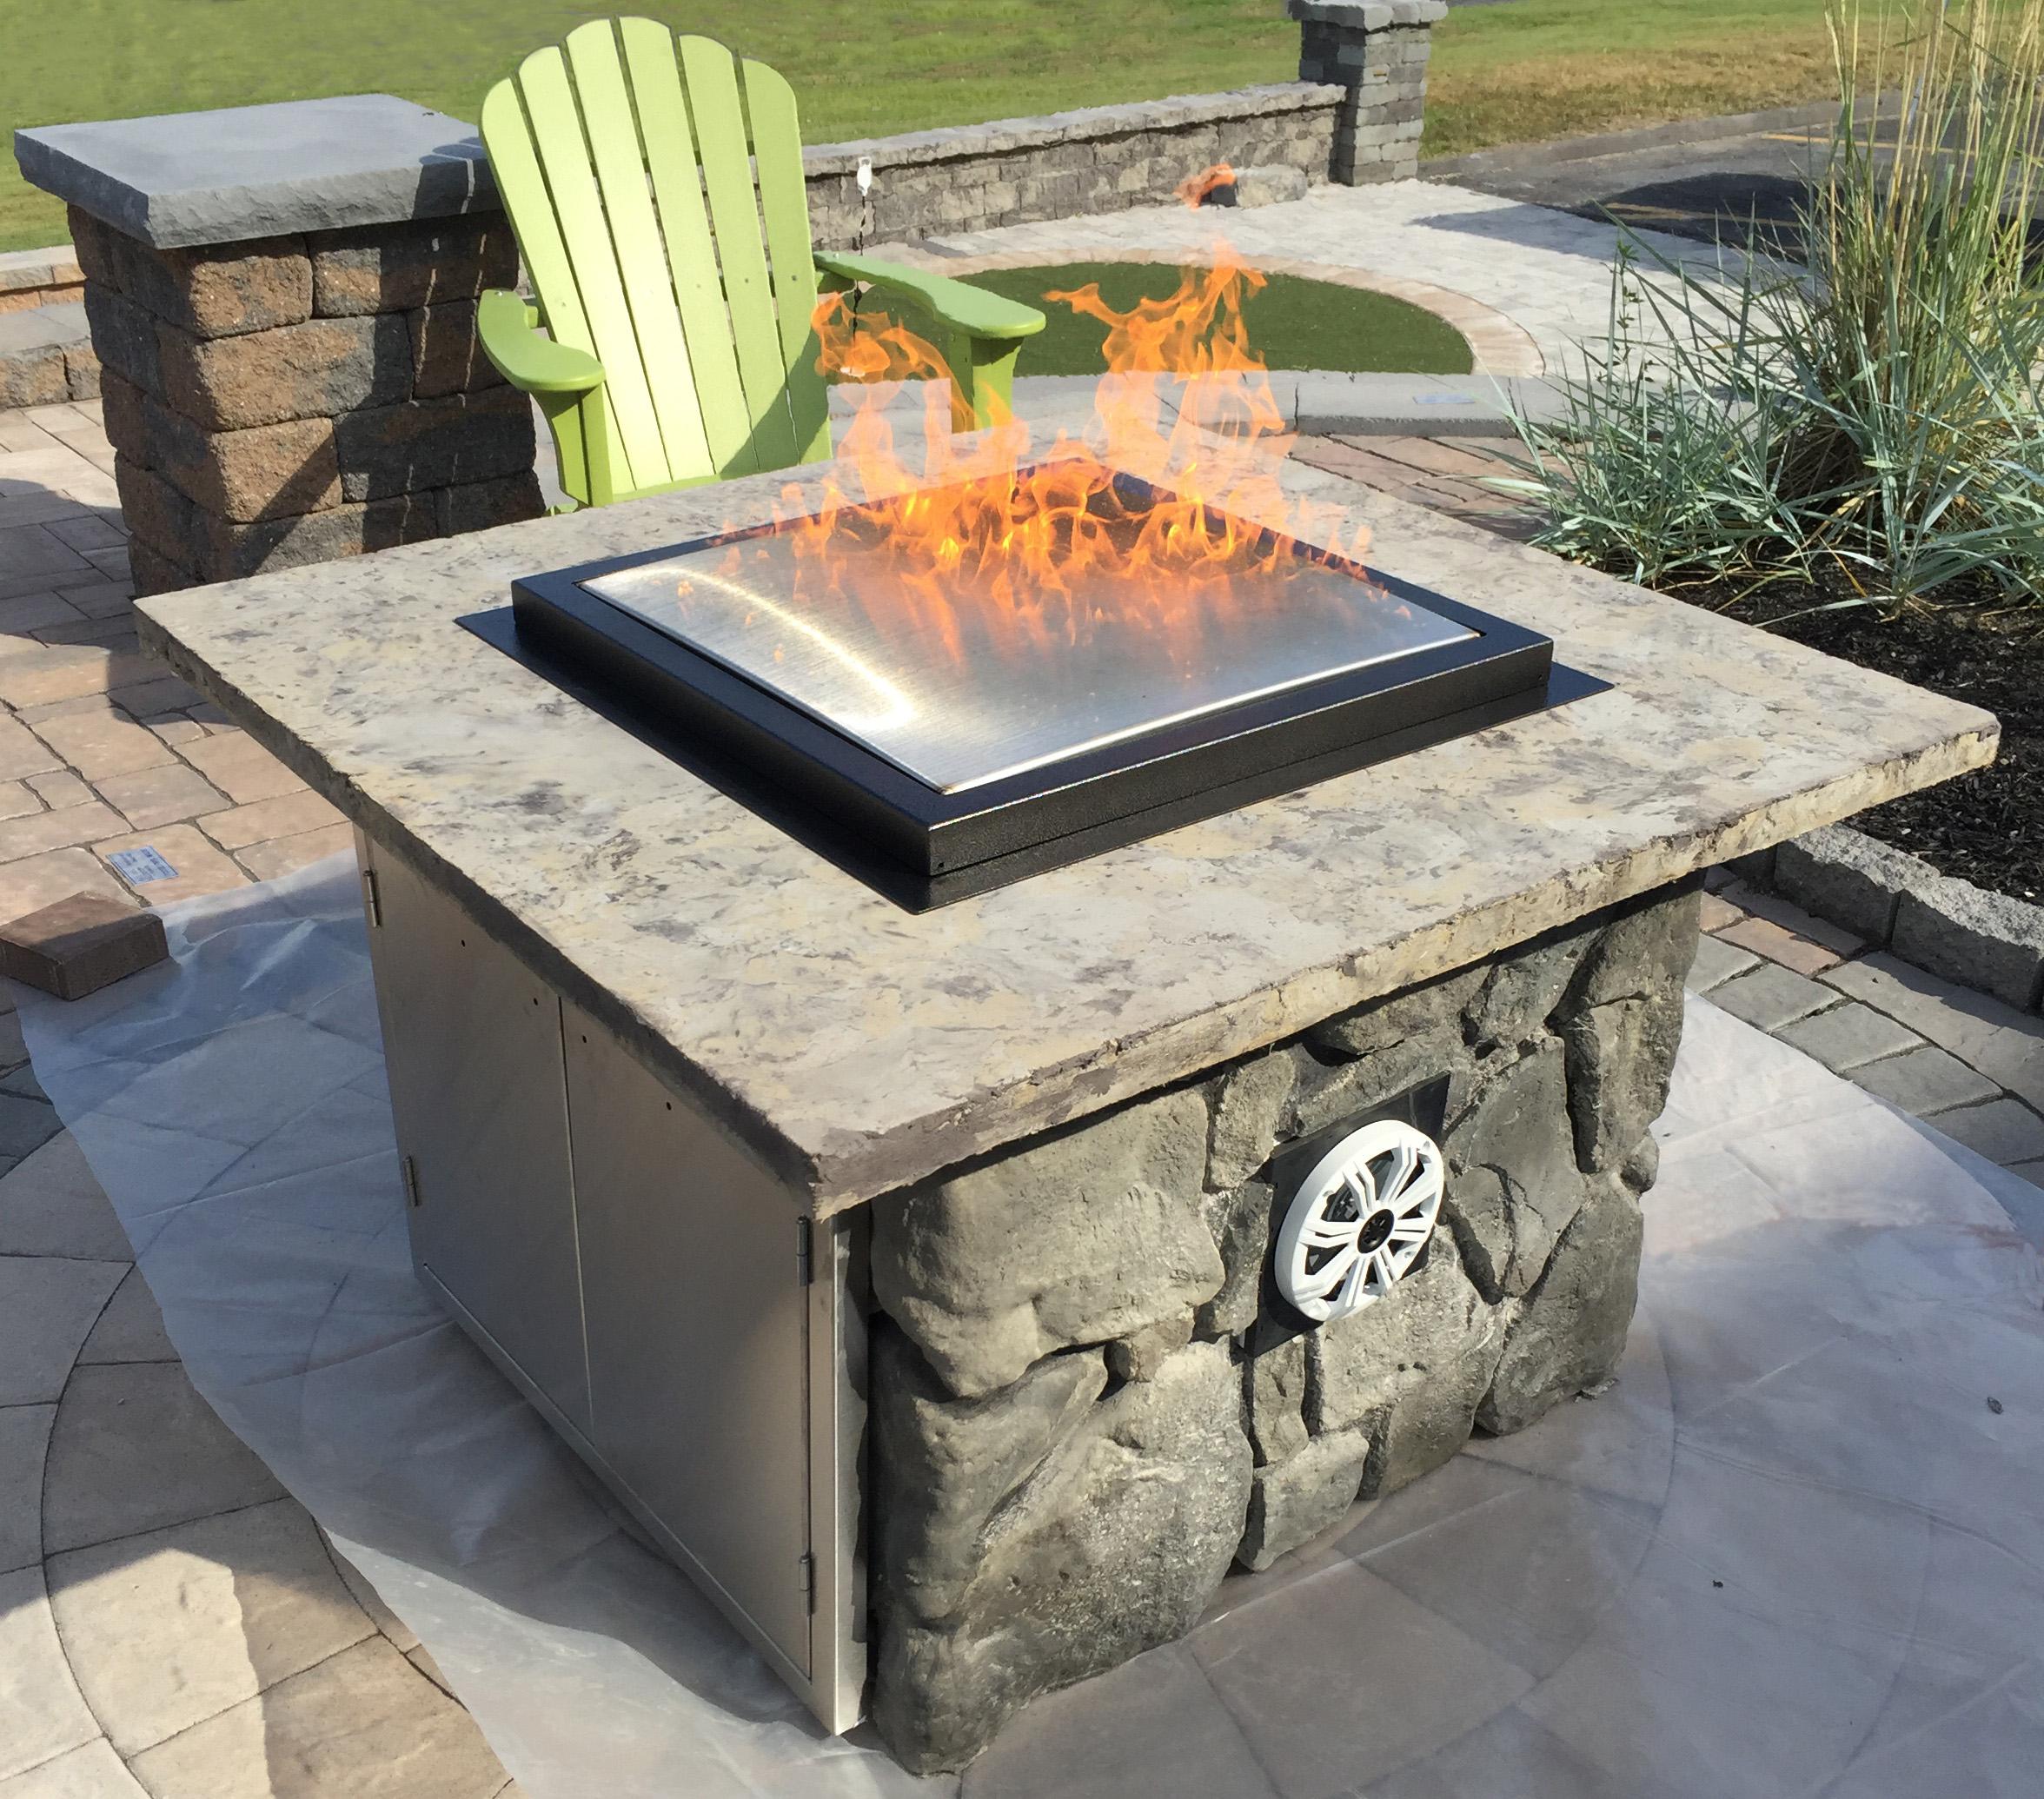 Blazing Beats fire table